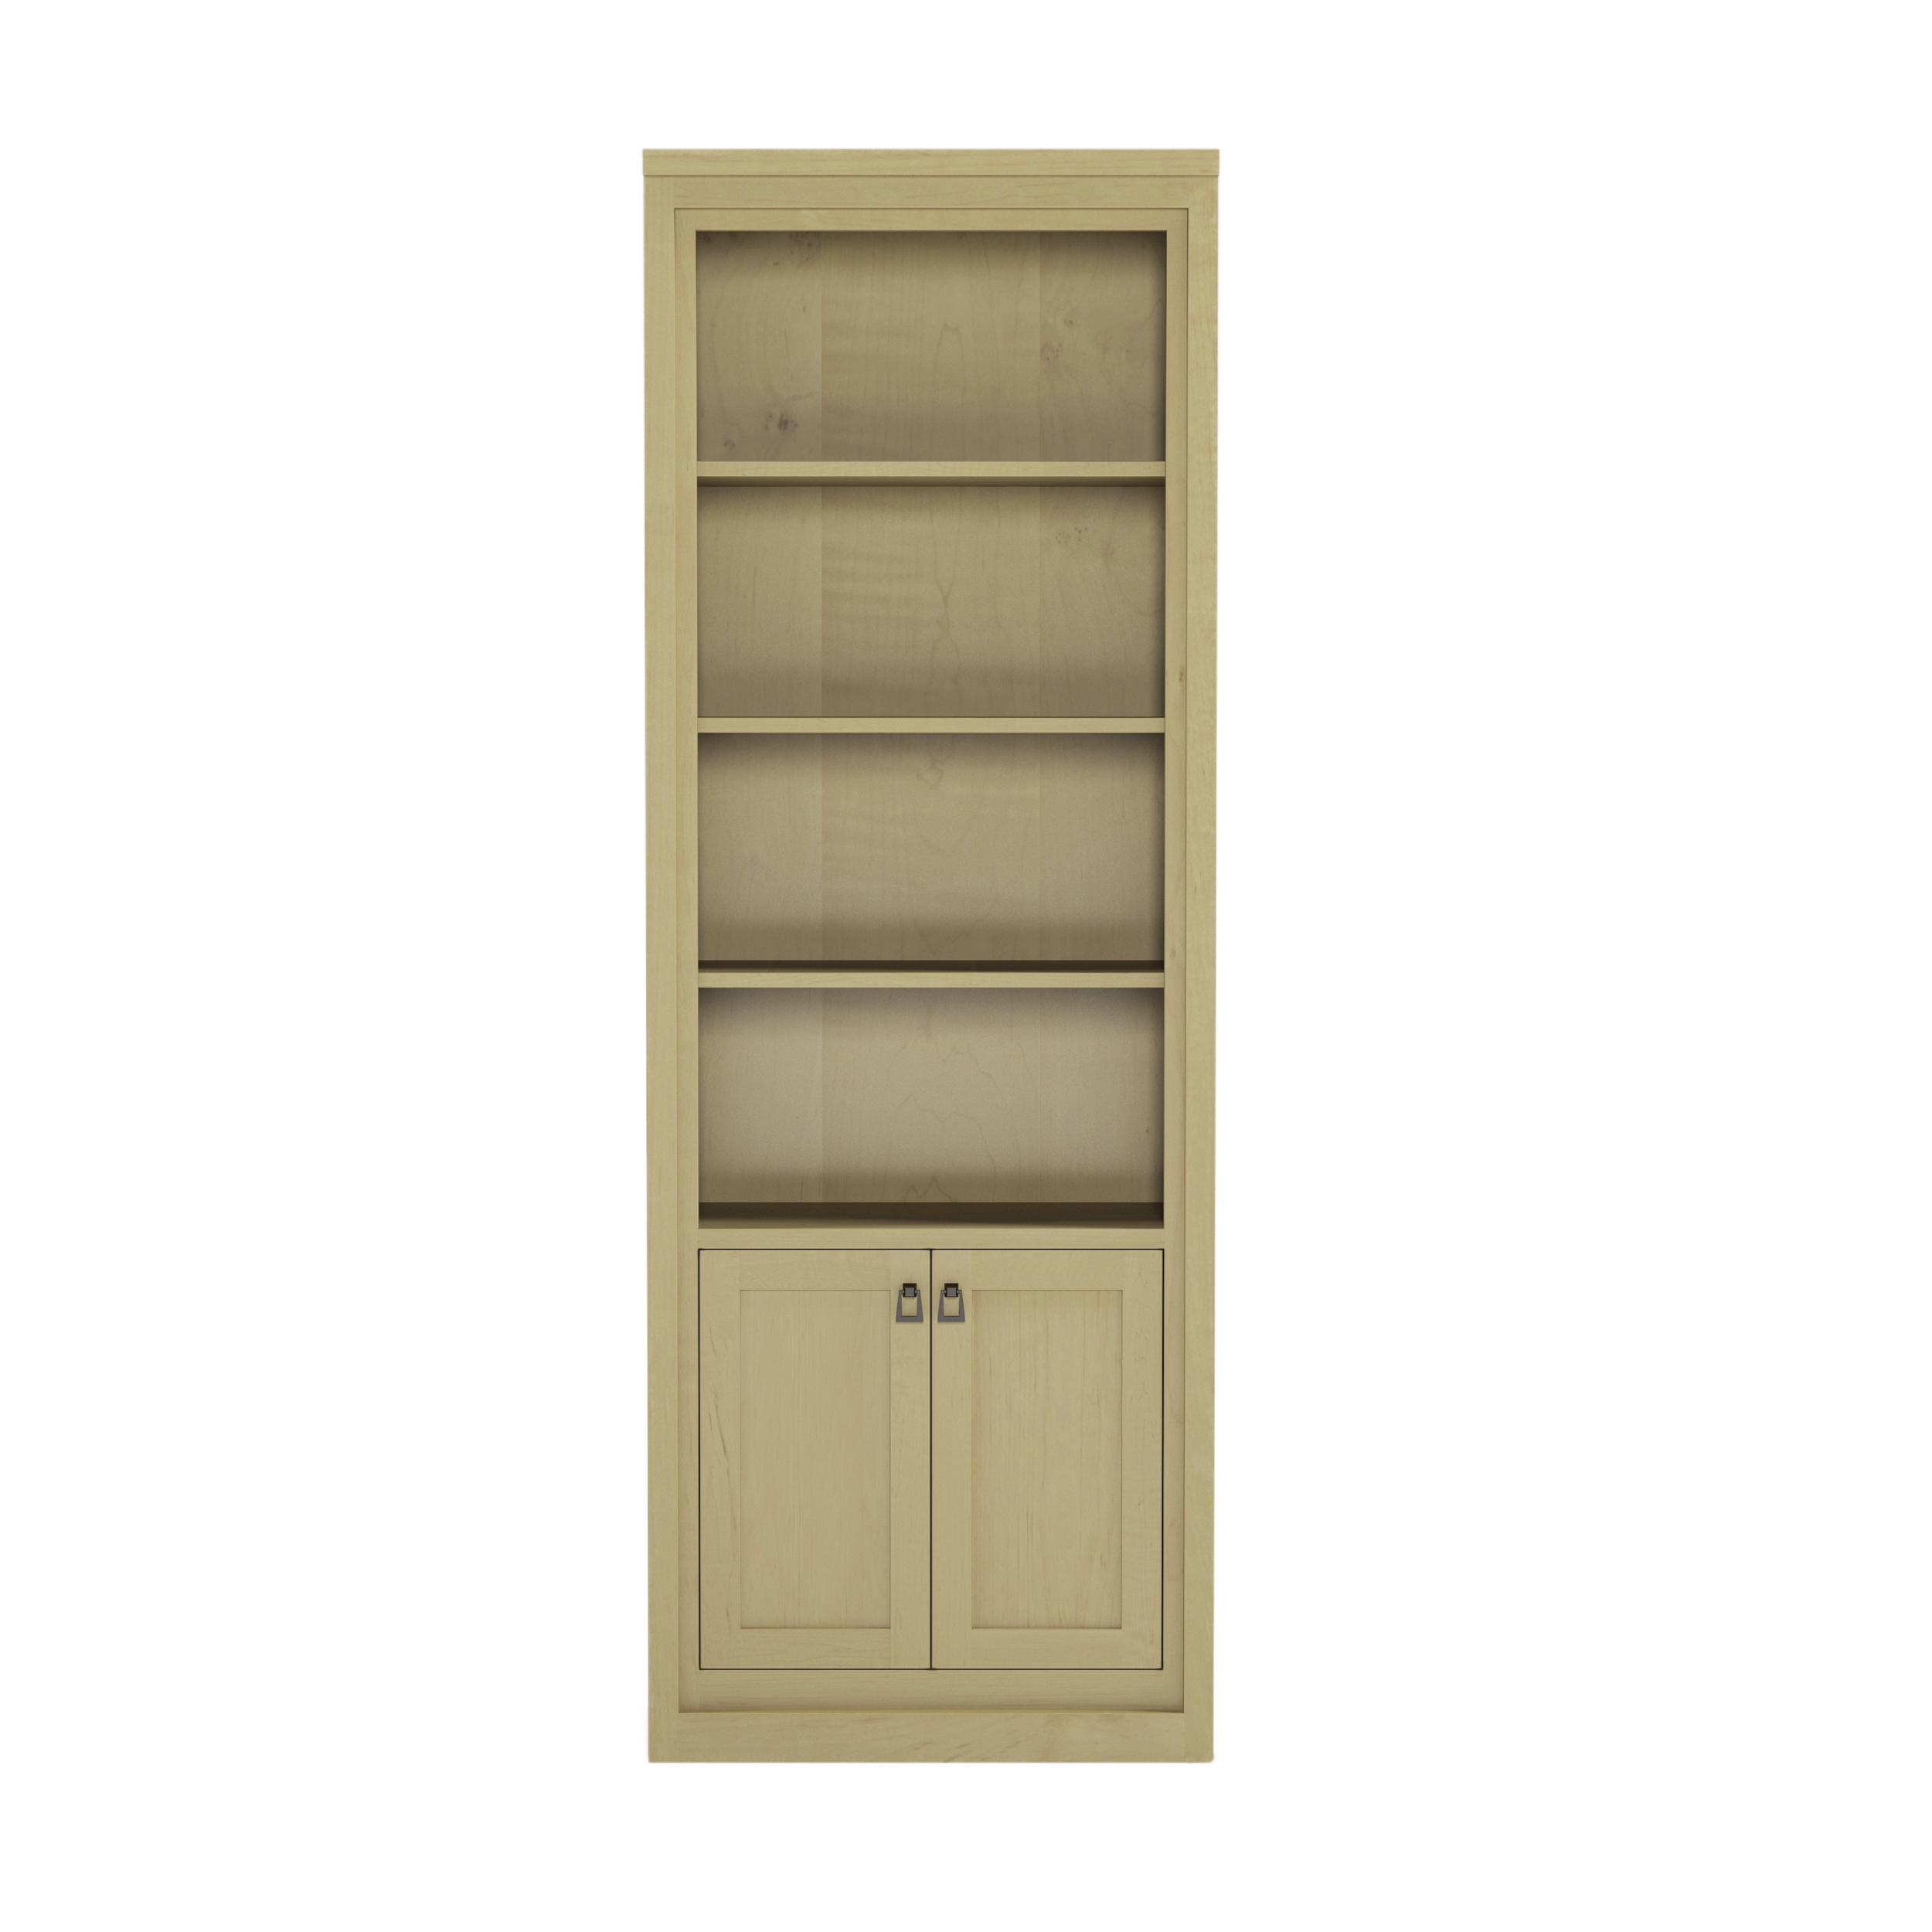 Framed_44 28″ Wide Bookshelf With Doors